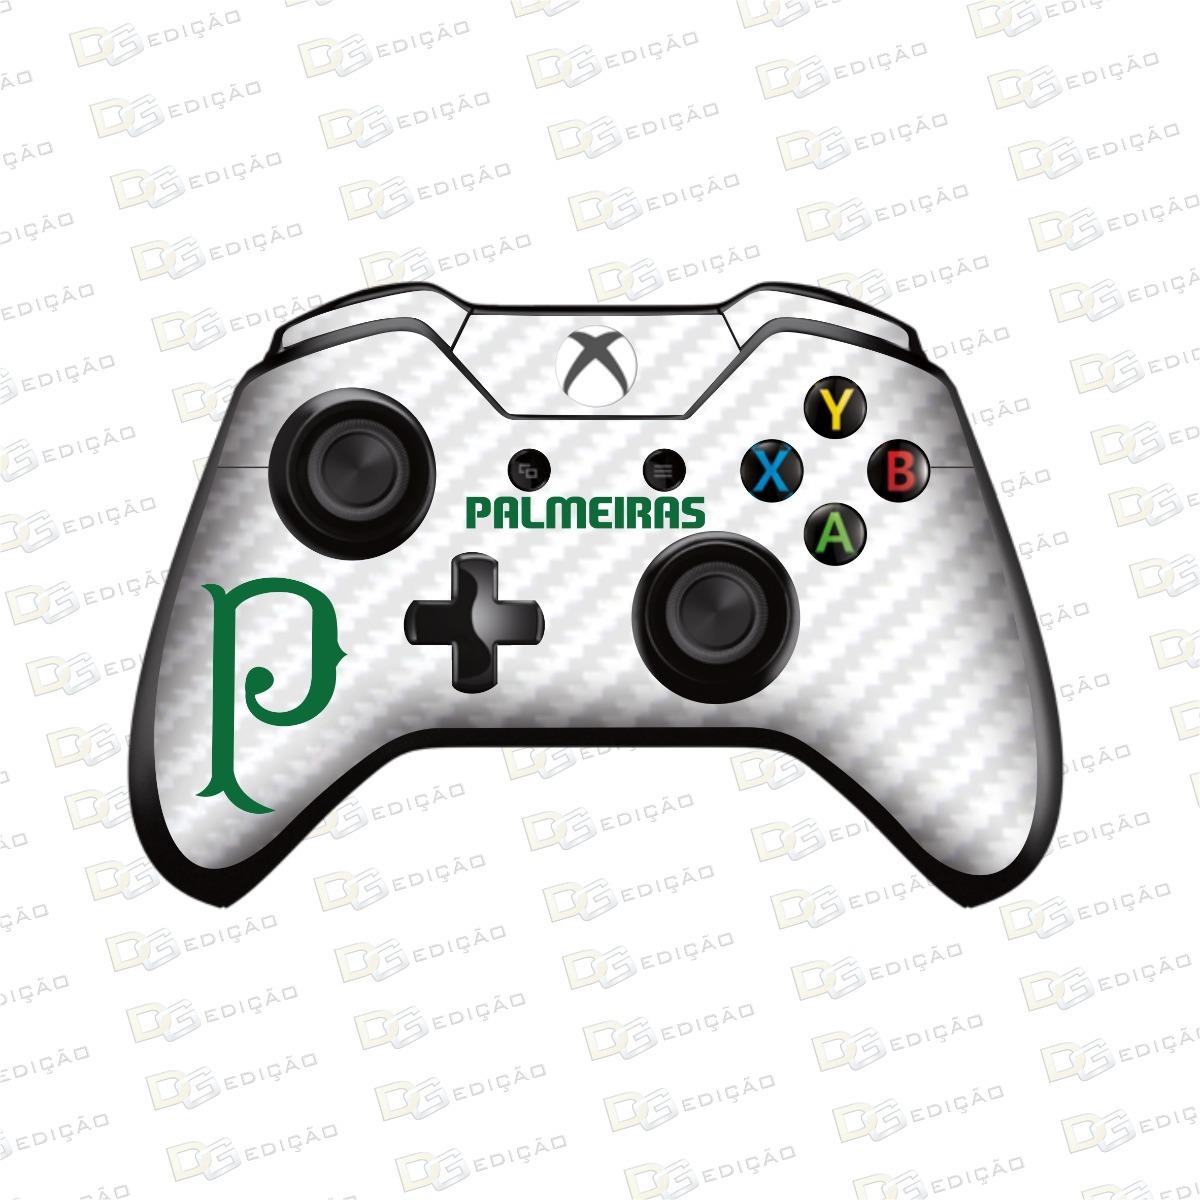 Palmeiras F C Adesivo Skin Controle Xbox One Carbono Branco R